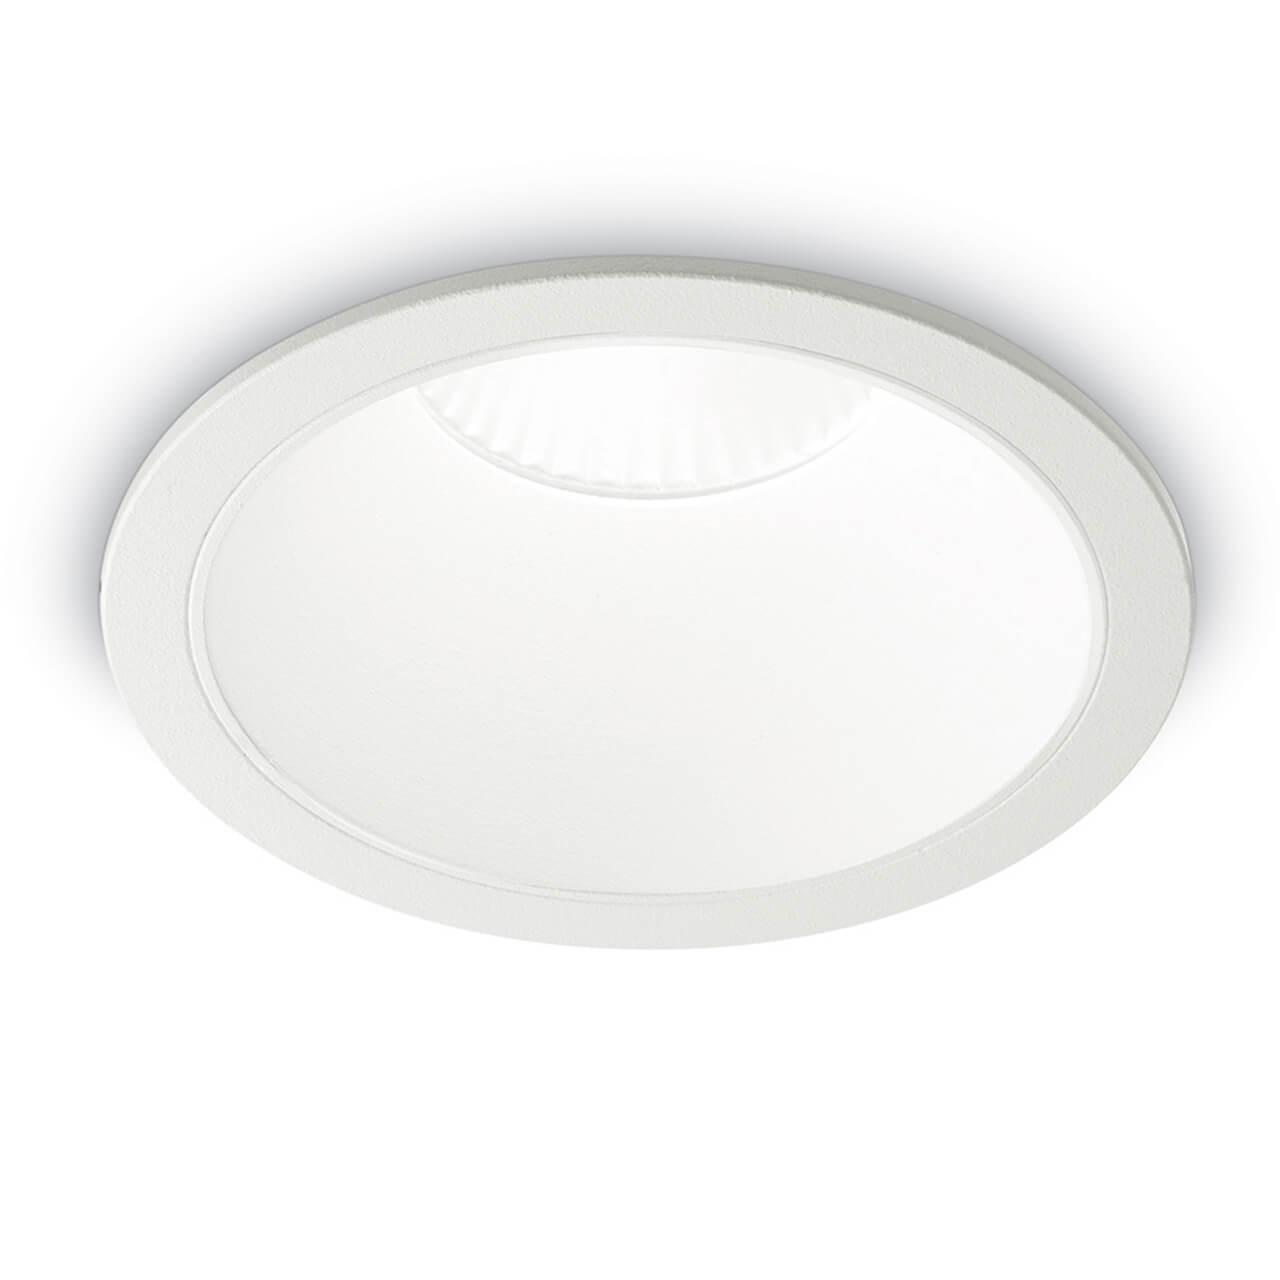 Встраиваемый светодиодный светильник Ideal Lux Game Round White White